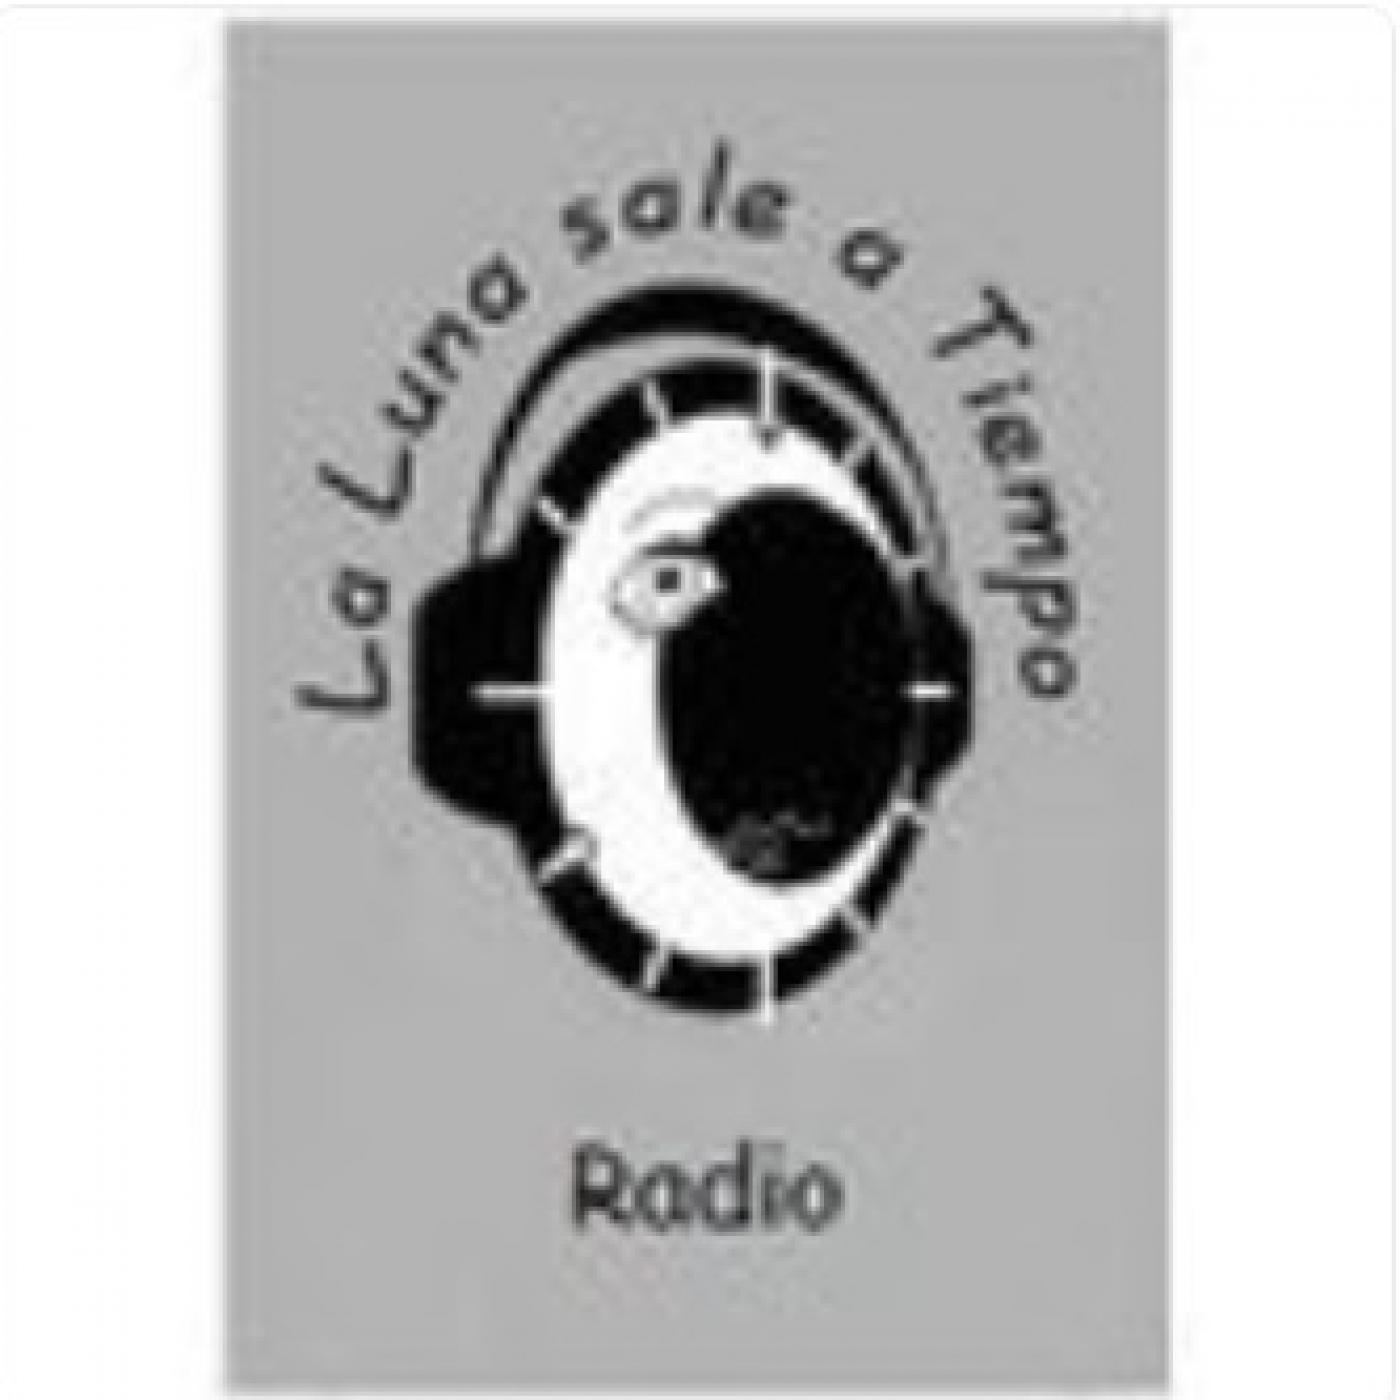 La Luna Sale a Tiempo - 16/10/20